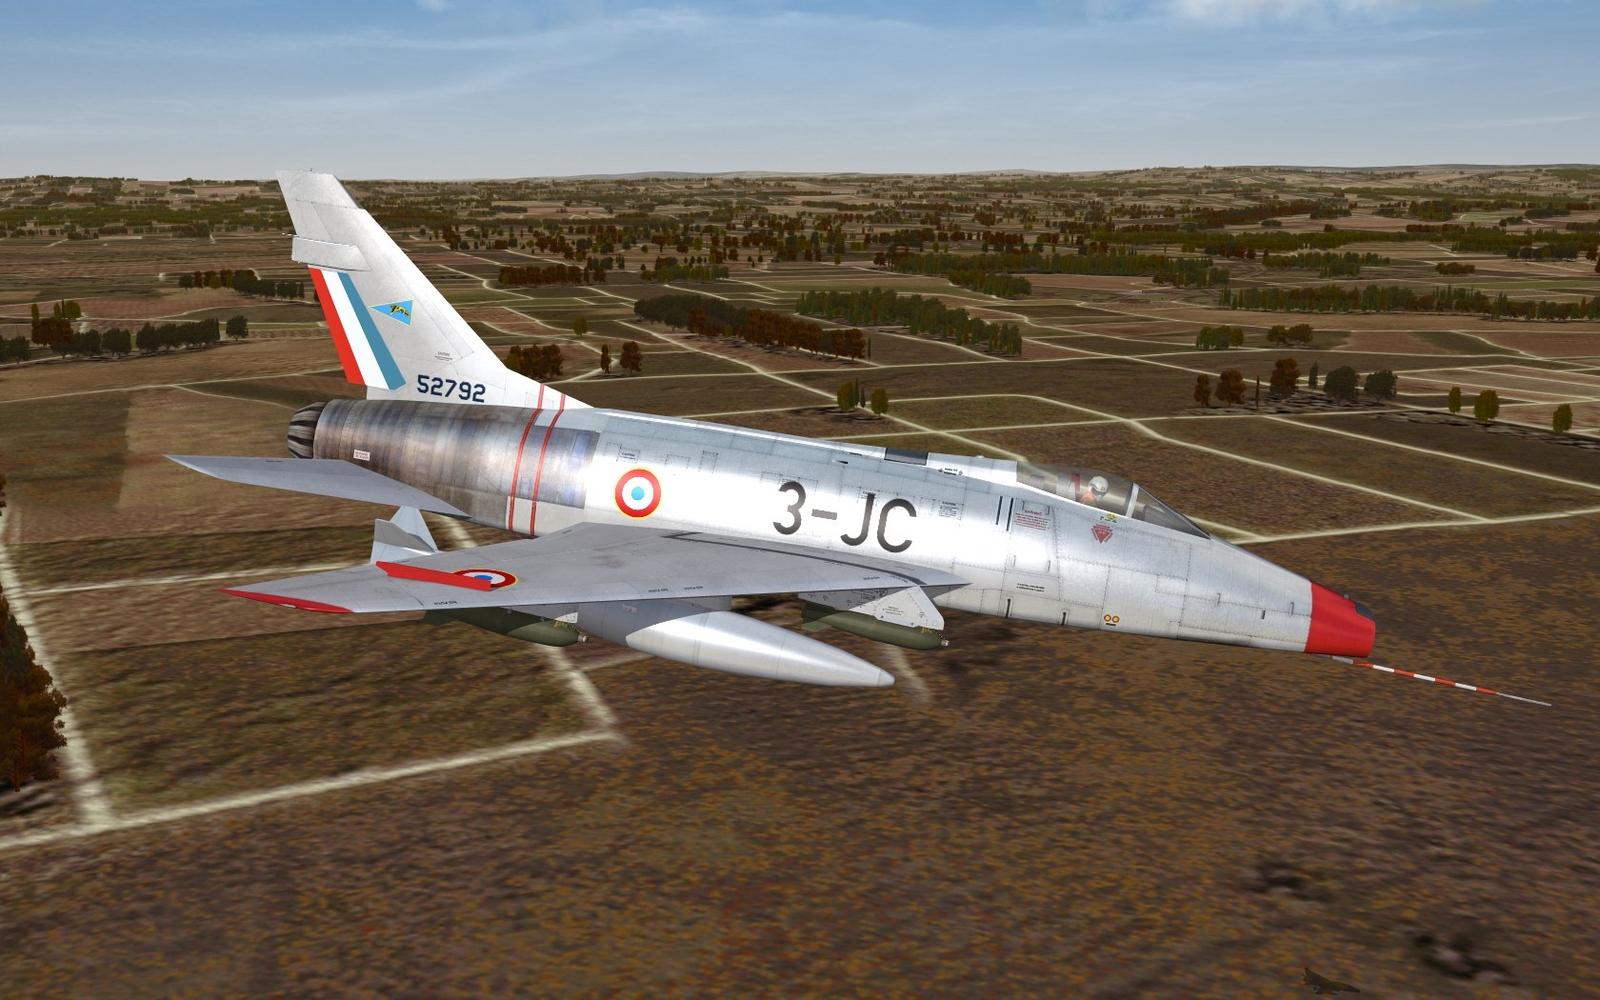 F-100D - EC 2/3 Champagne - ca. 1962